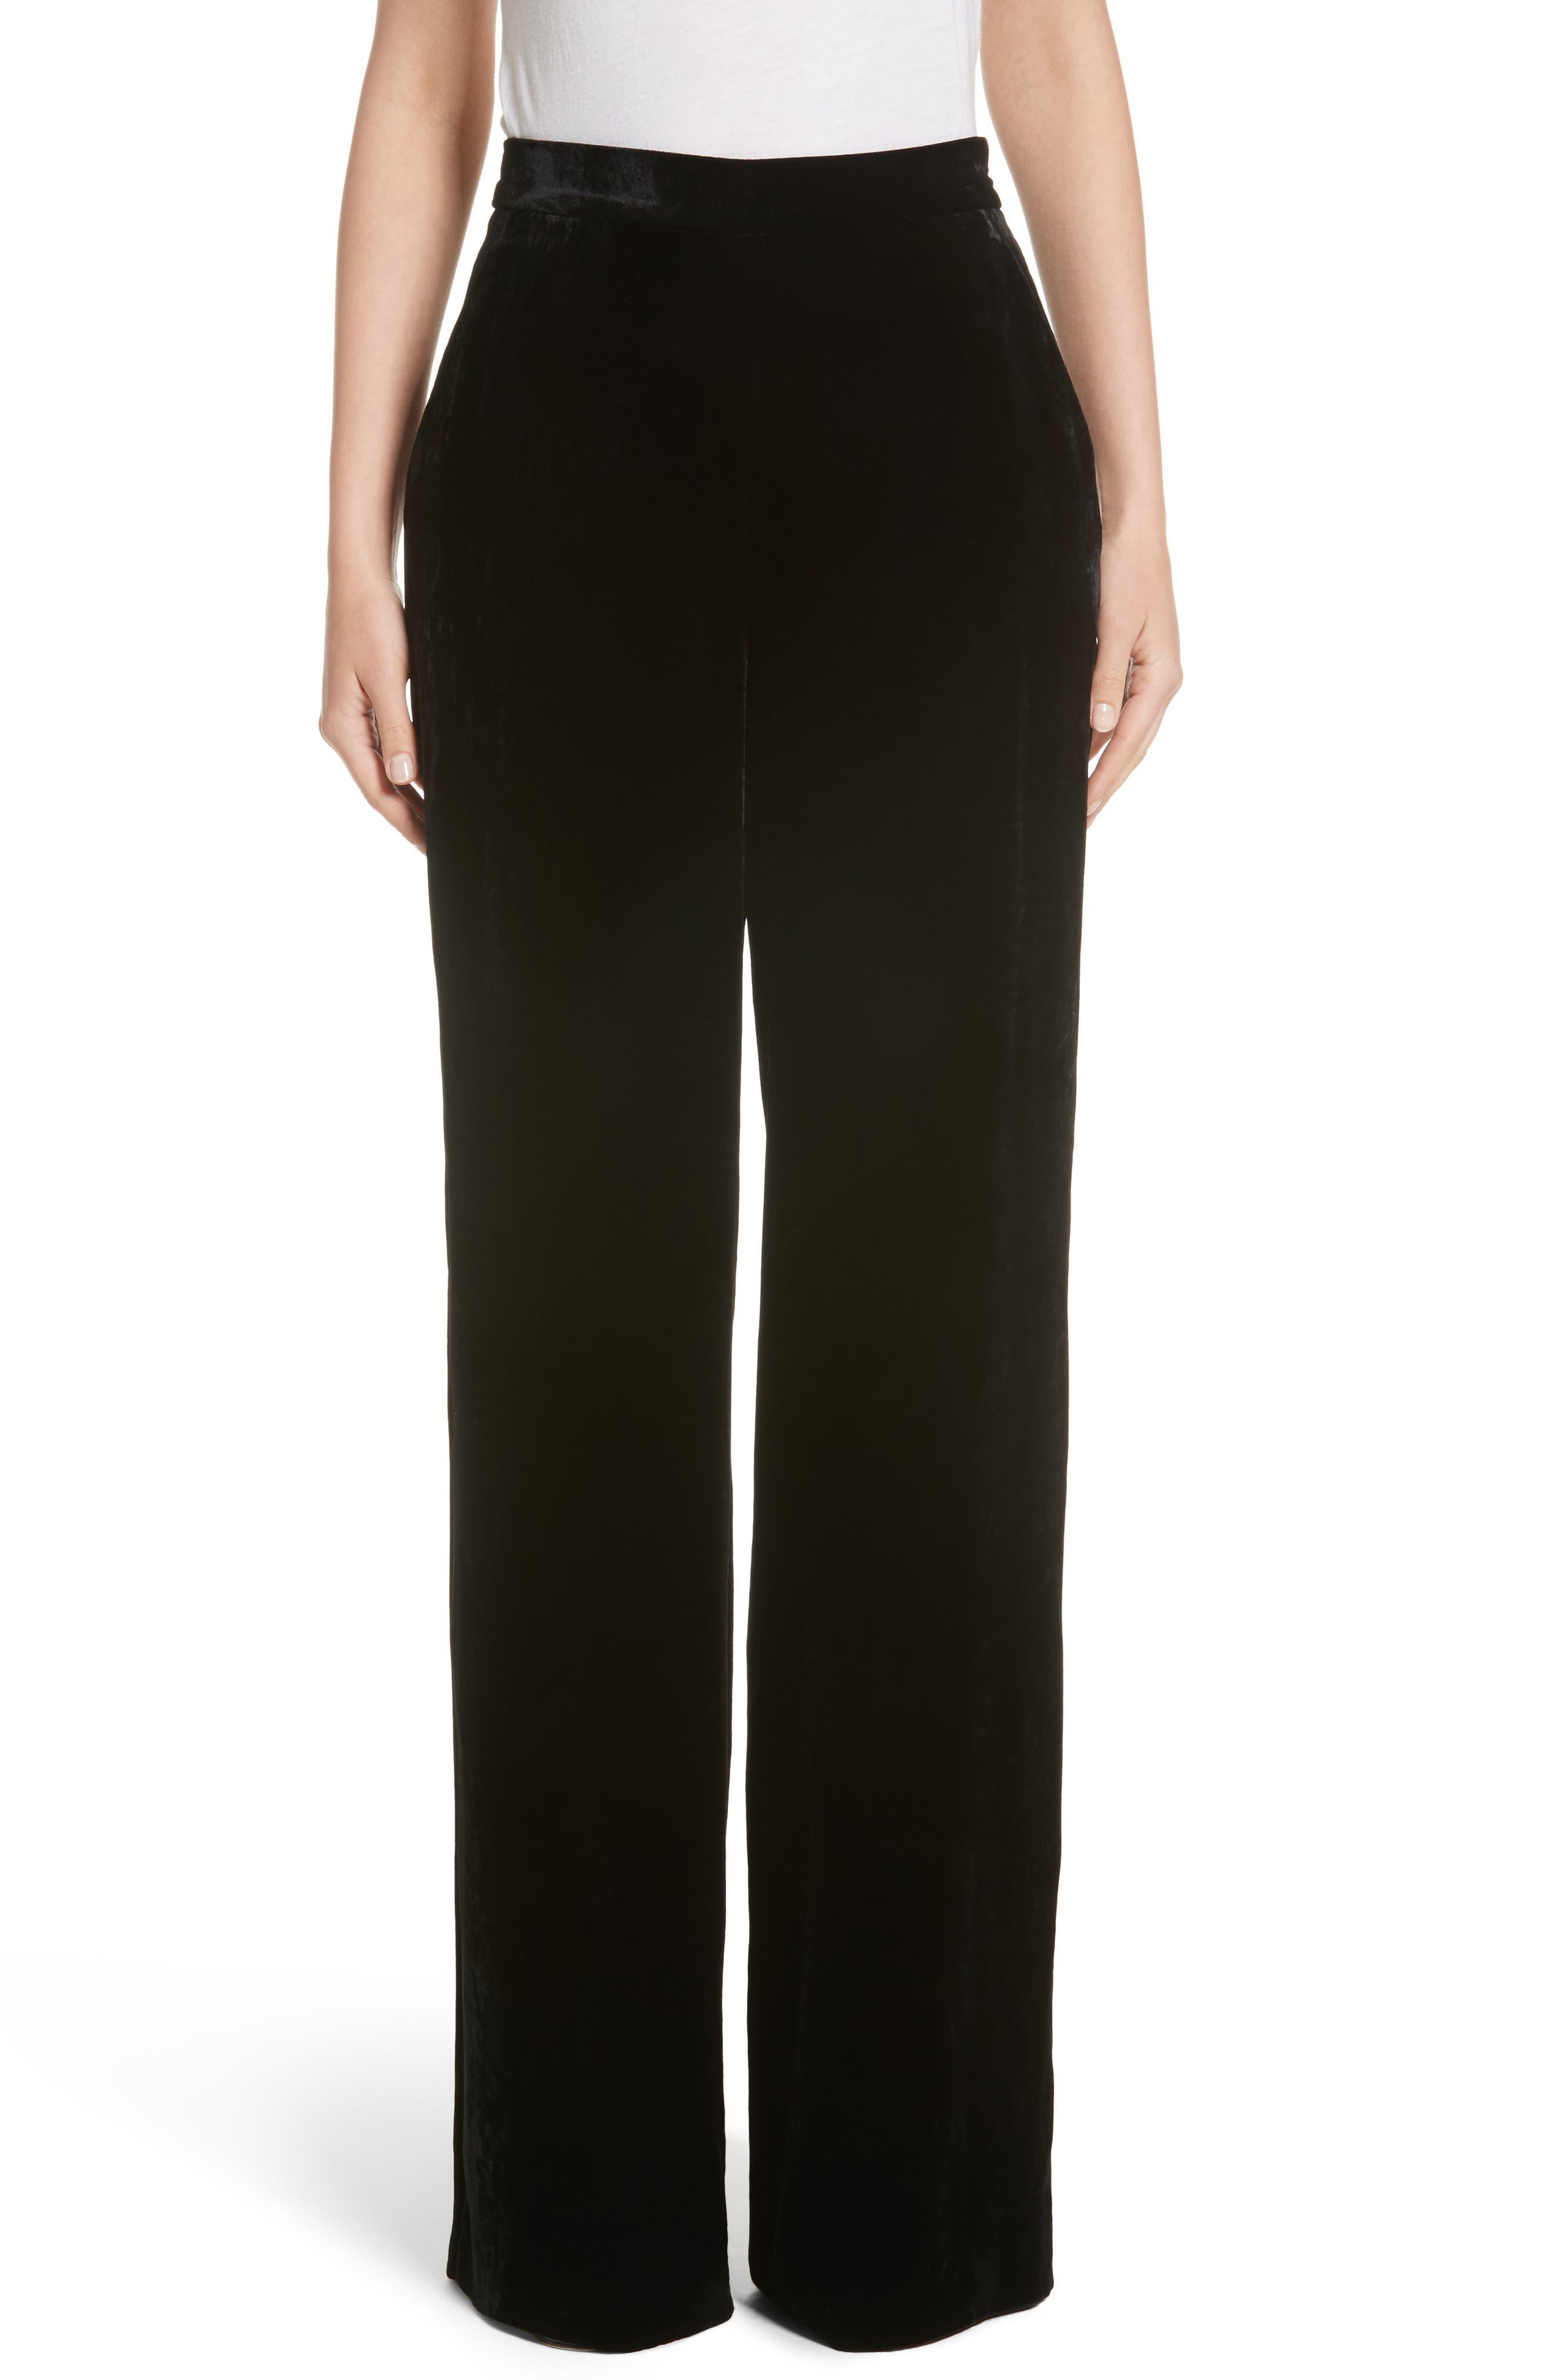 Velvet Wide Leg Pants,                         Main,                         color, Black